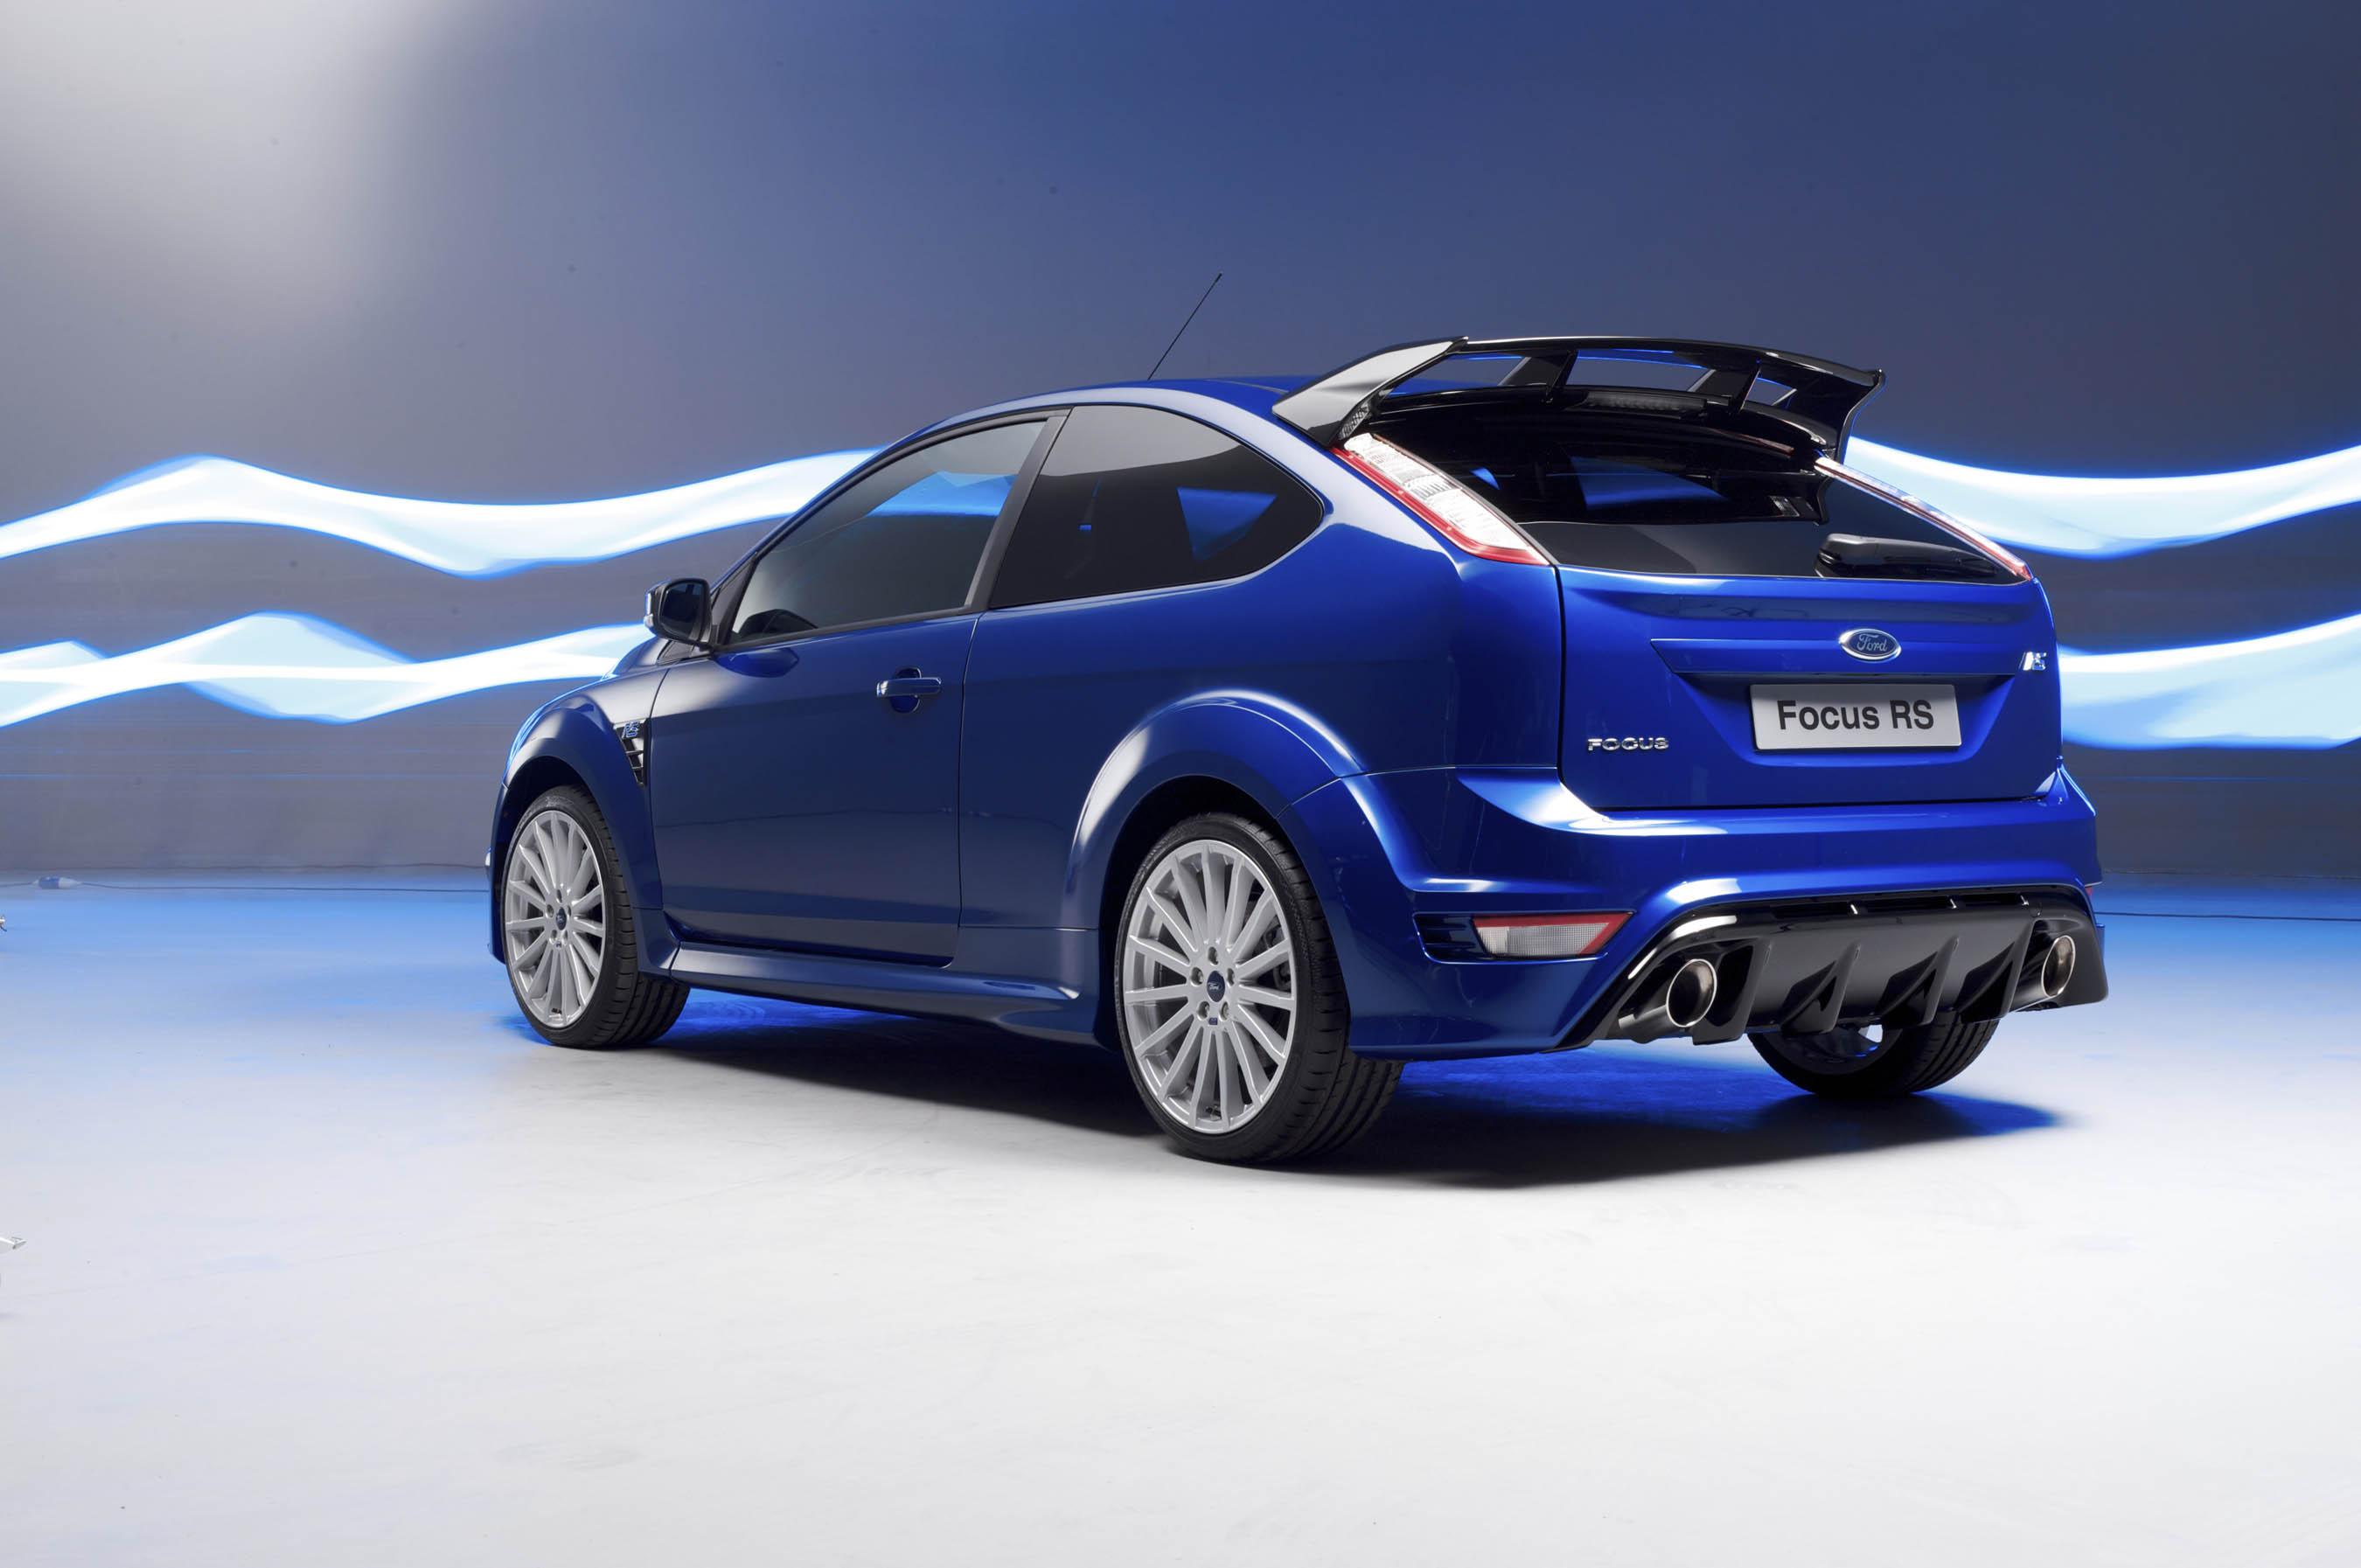 File:Ford Focus RS Mk II Performance Blue 003.jpg - Wikimedia Commons